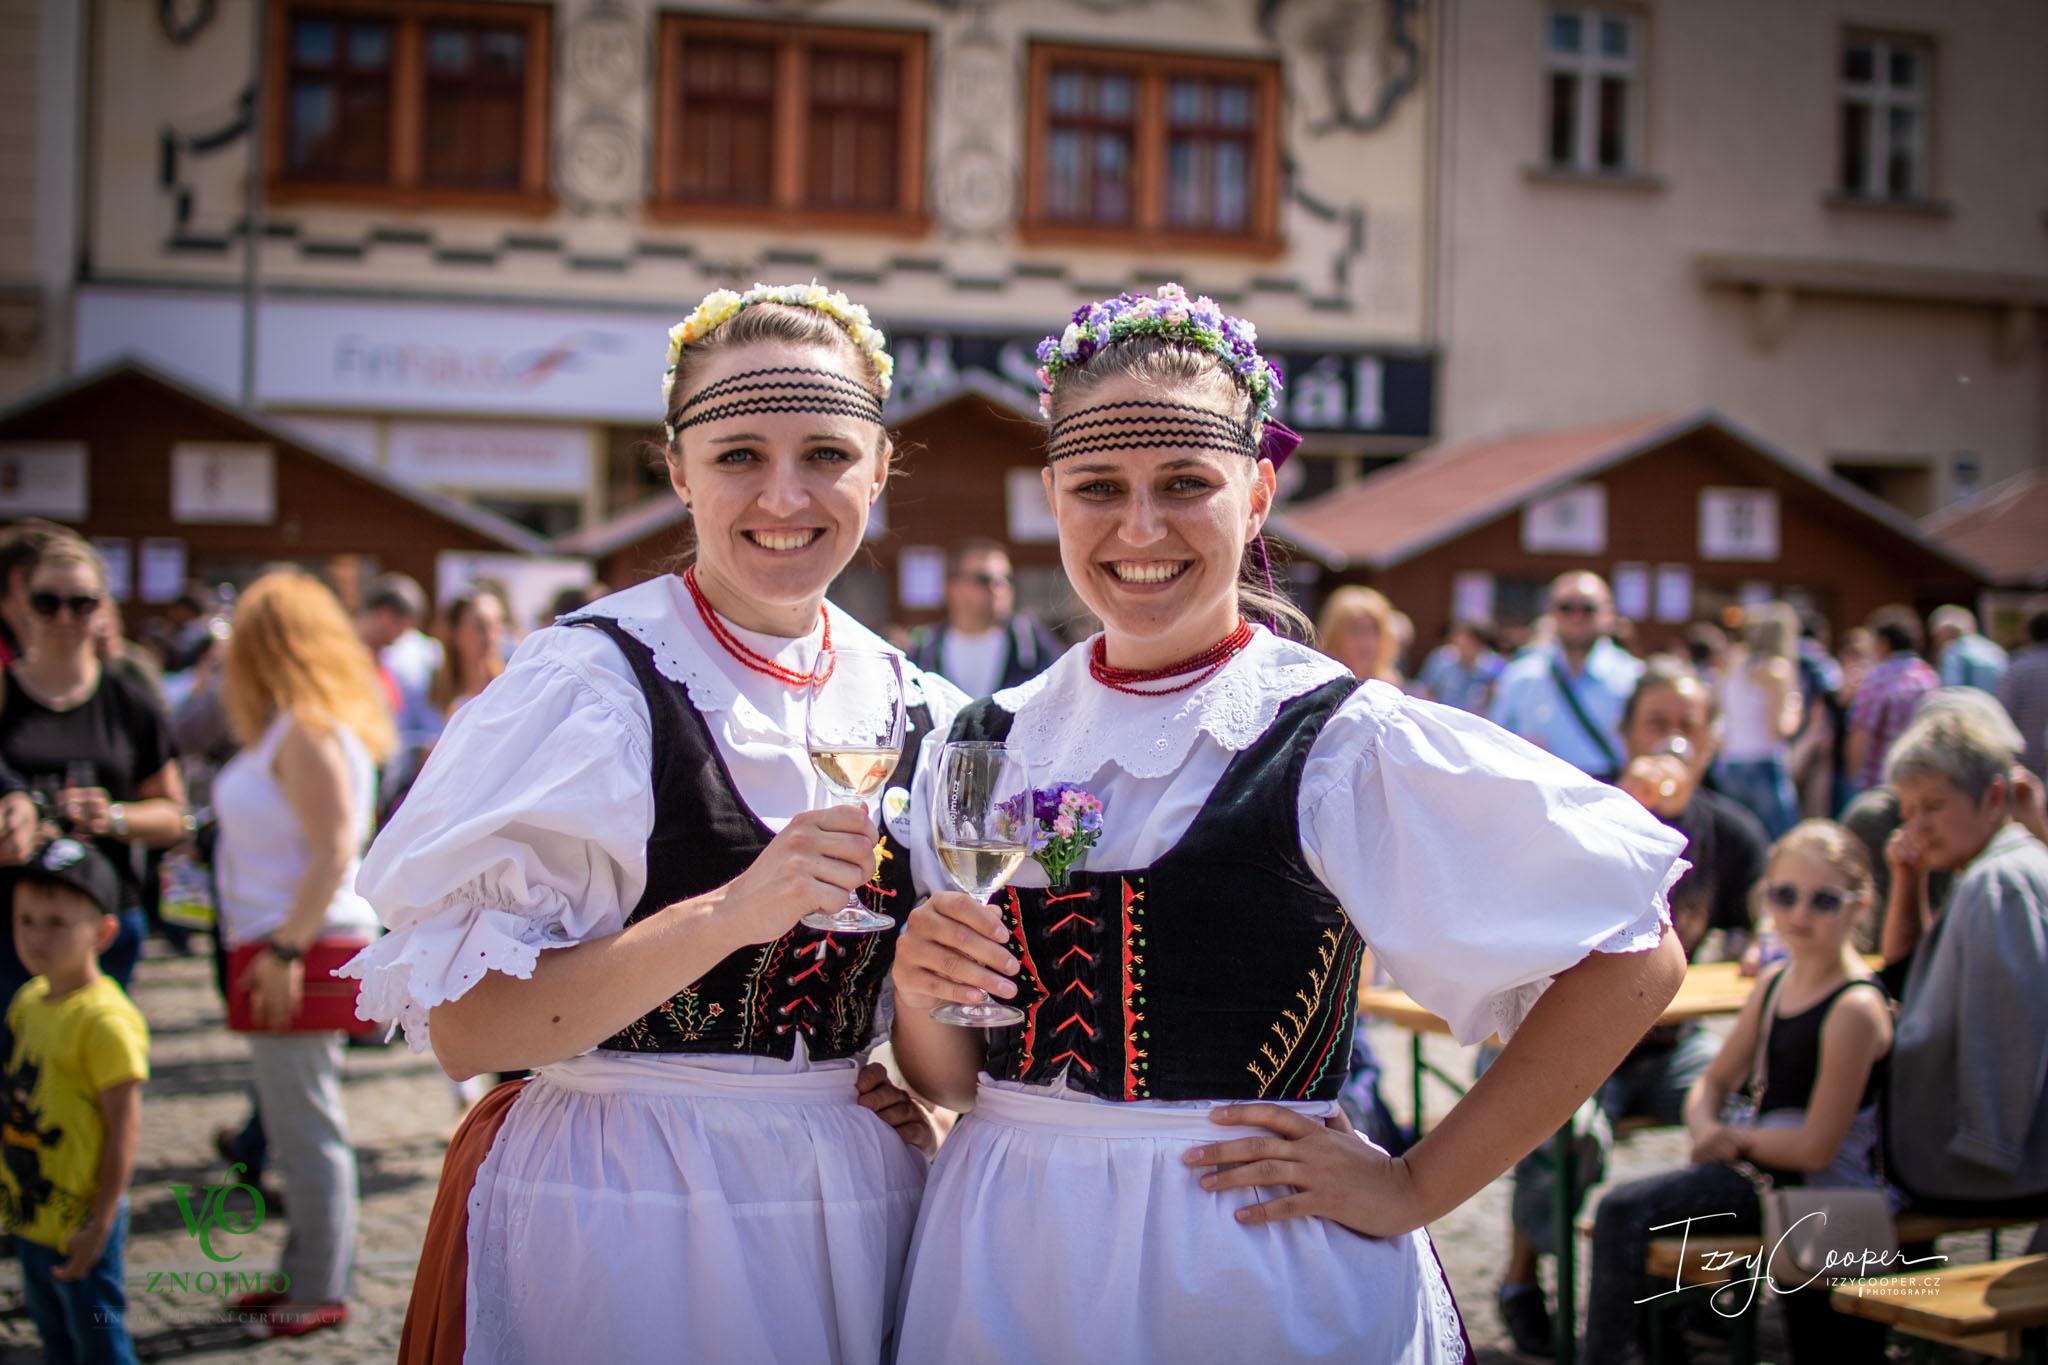 Festival VOC Znojmo